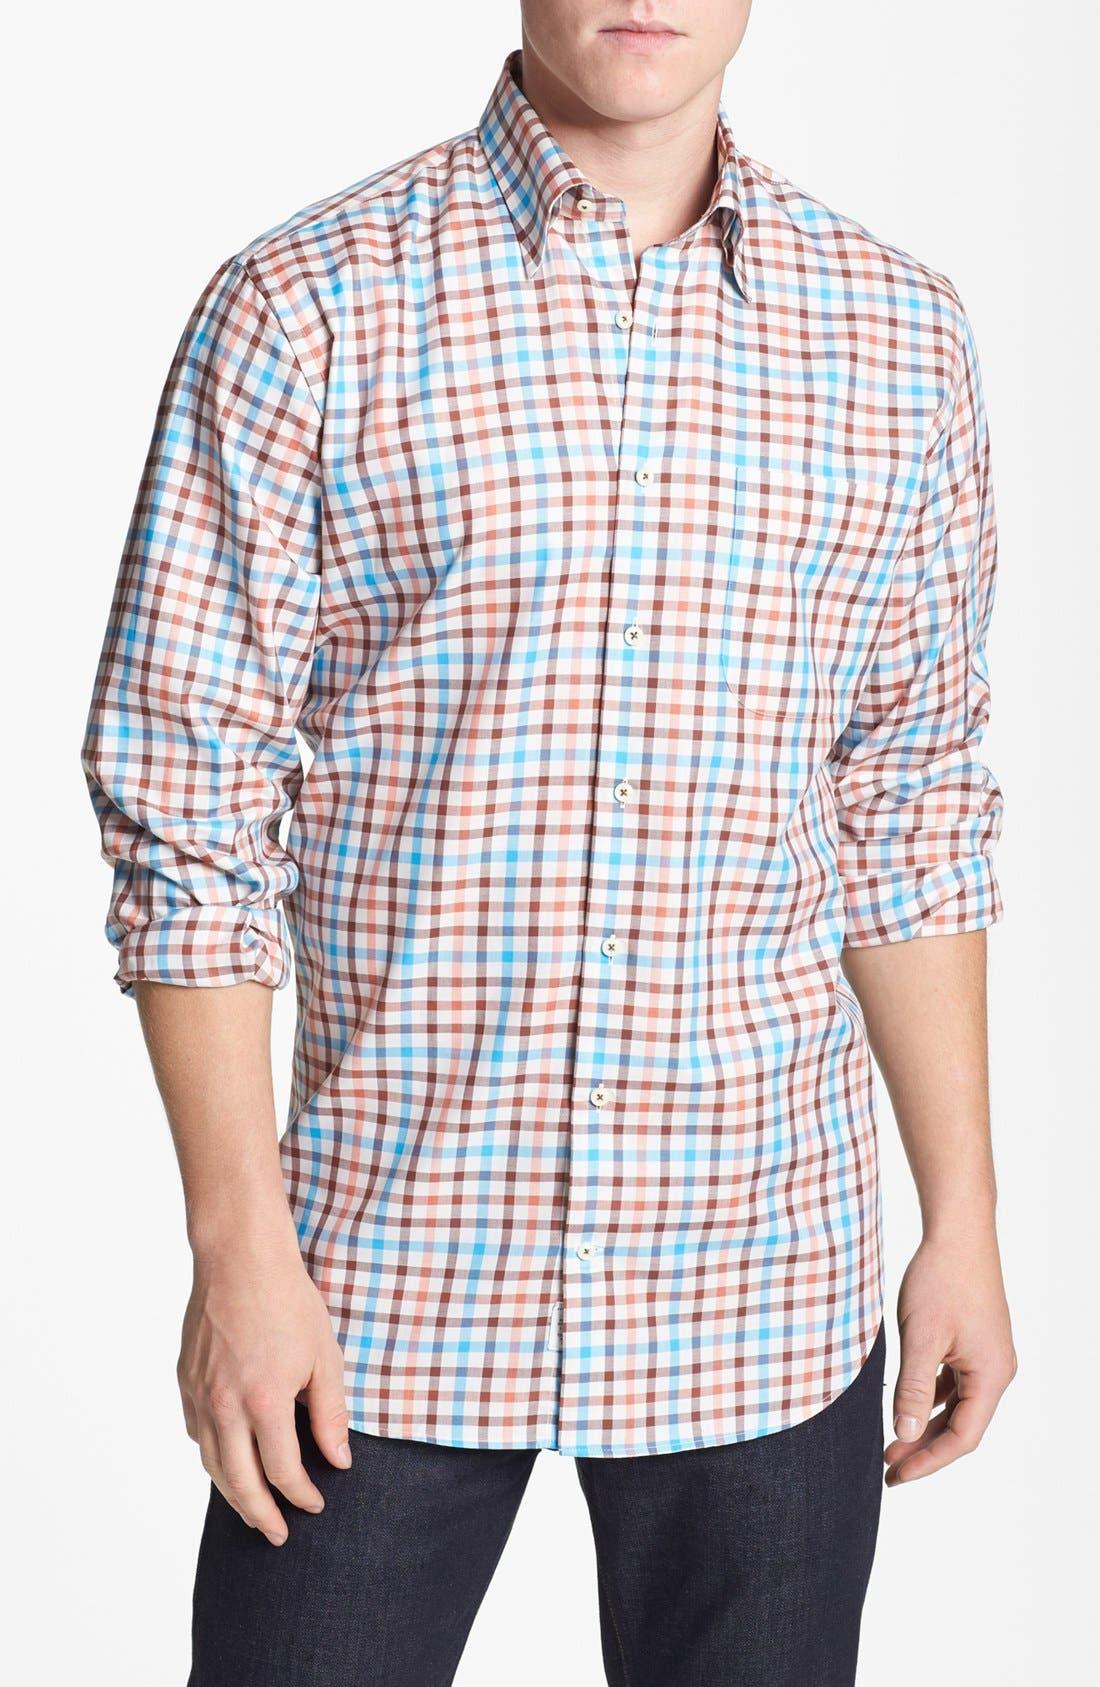 Alternate Image 1 Selected - Peter Millar 'Provence' Regular Fit Sport Shirt